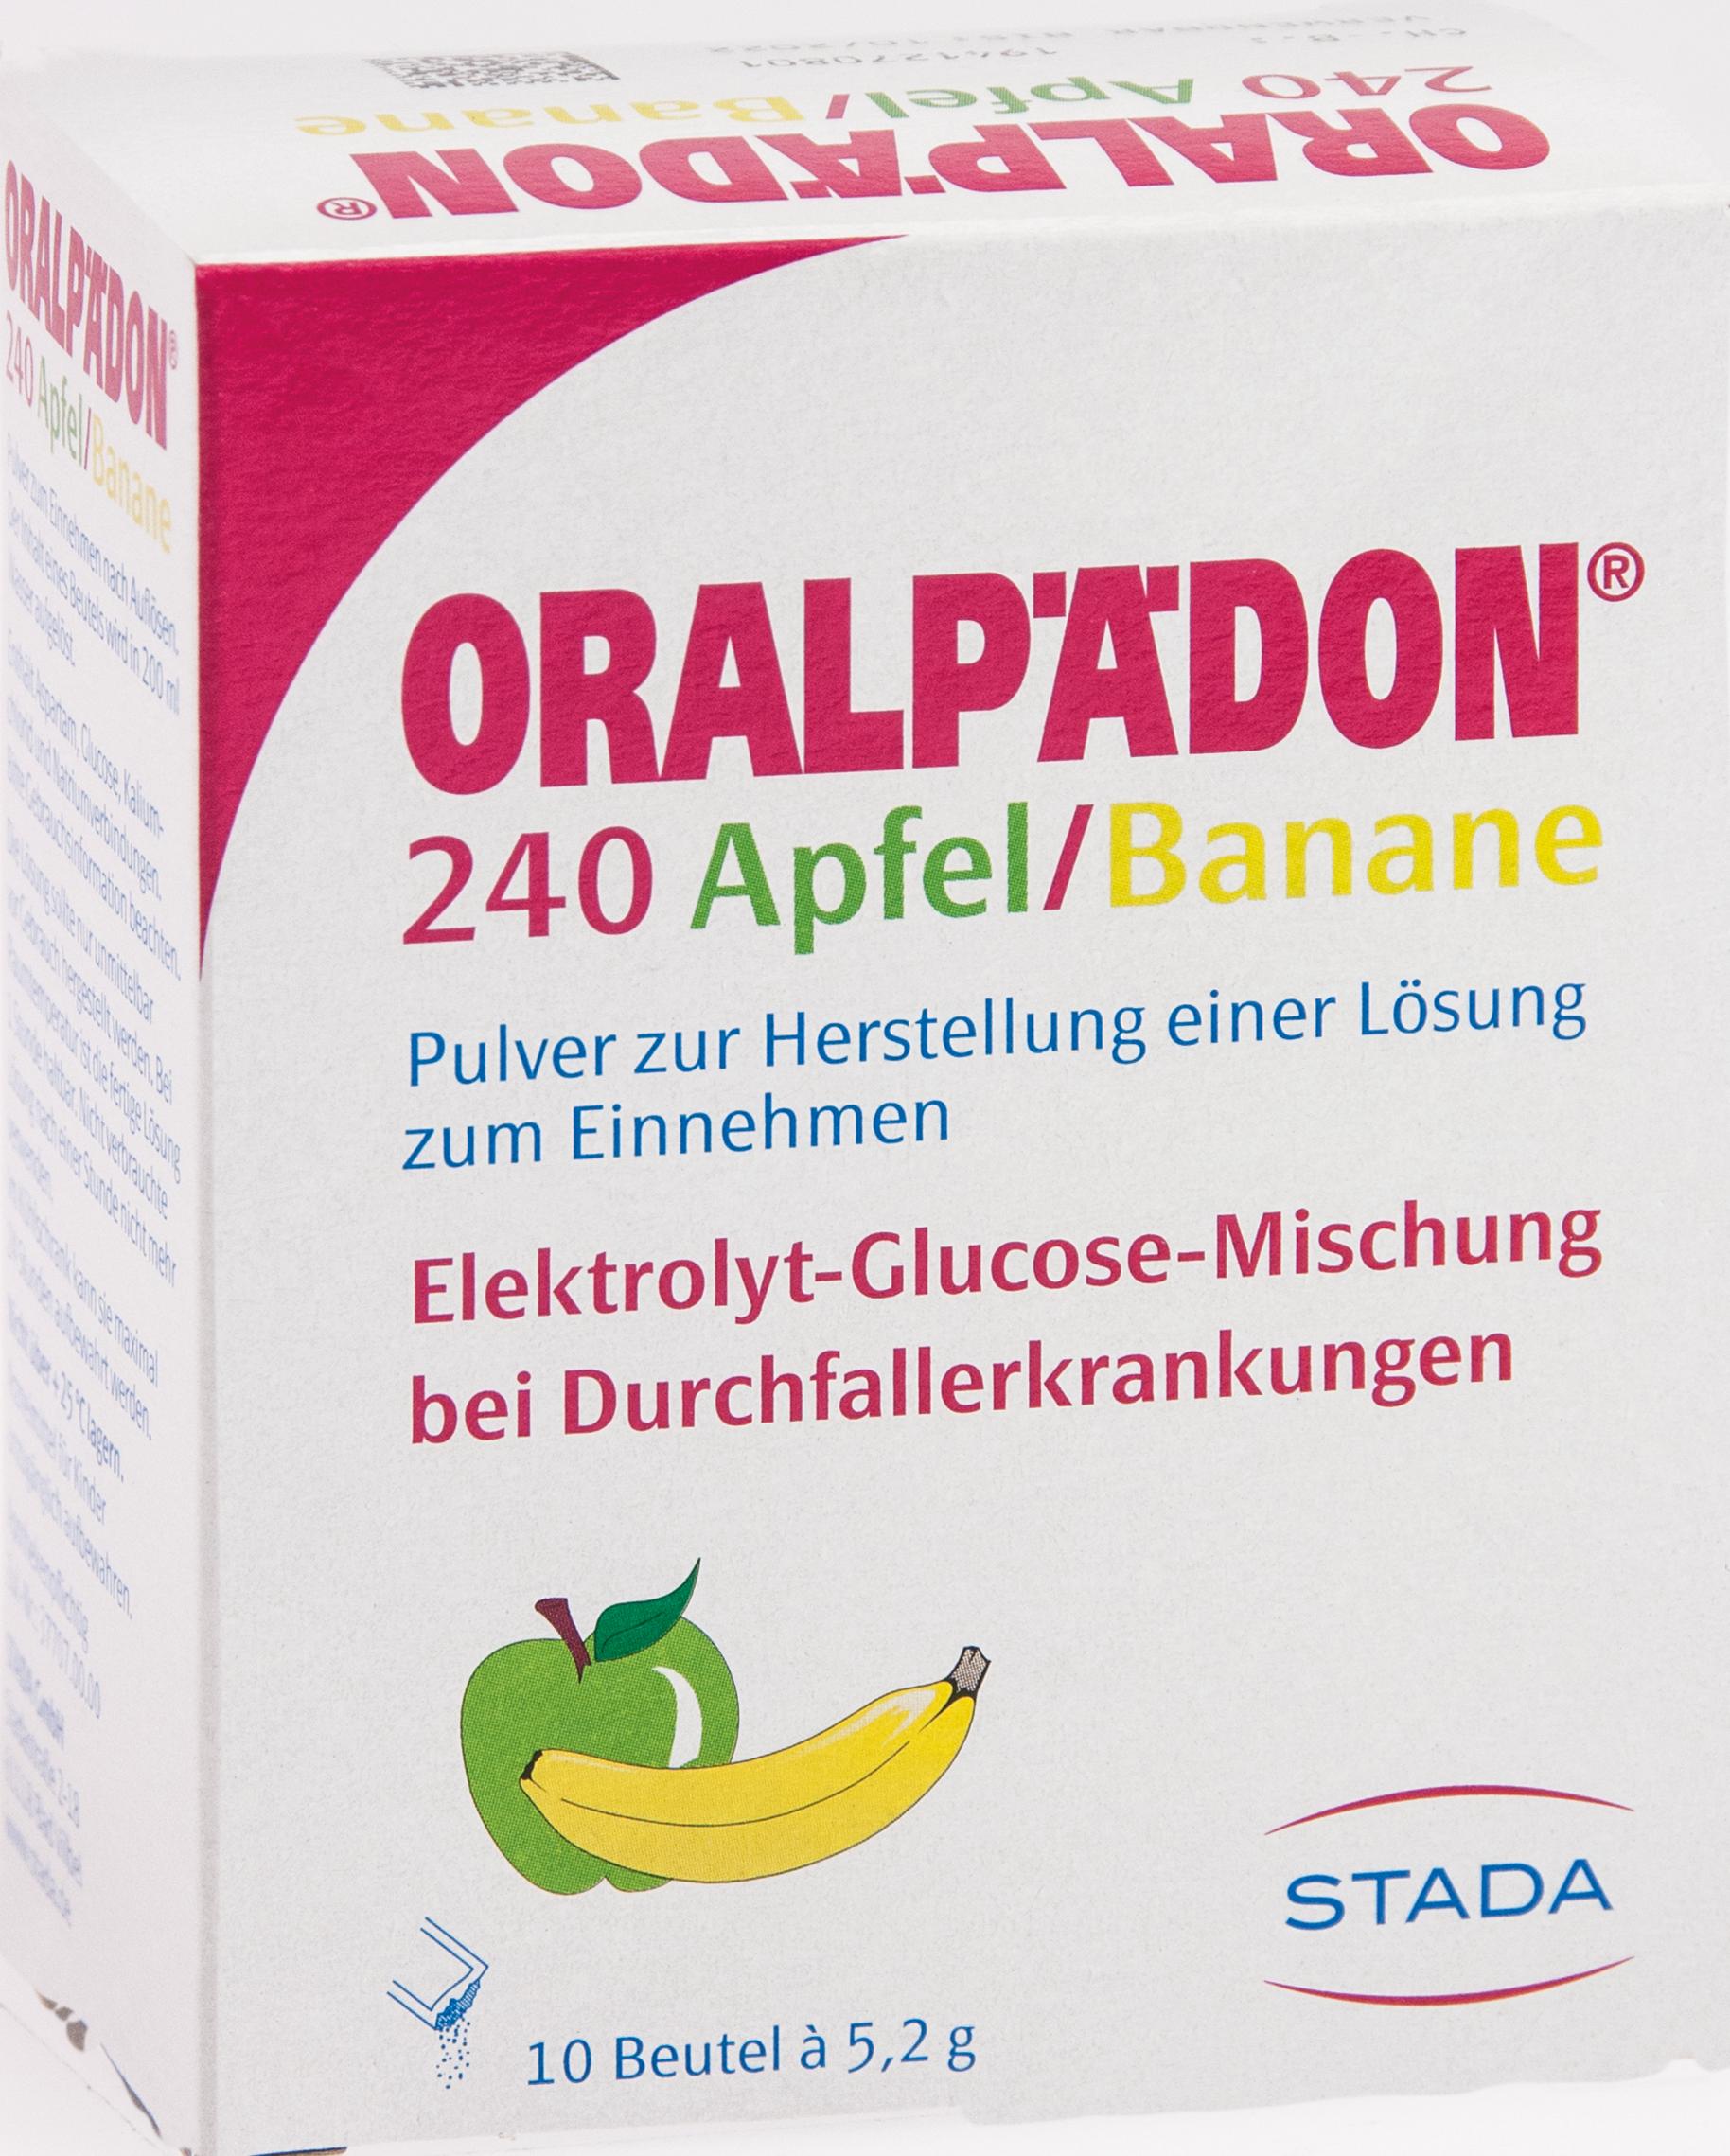 Oralpädon 240 Apfel-Banane